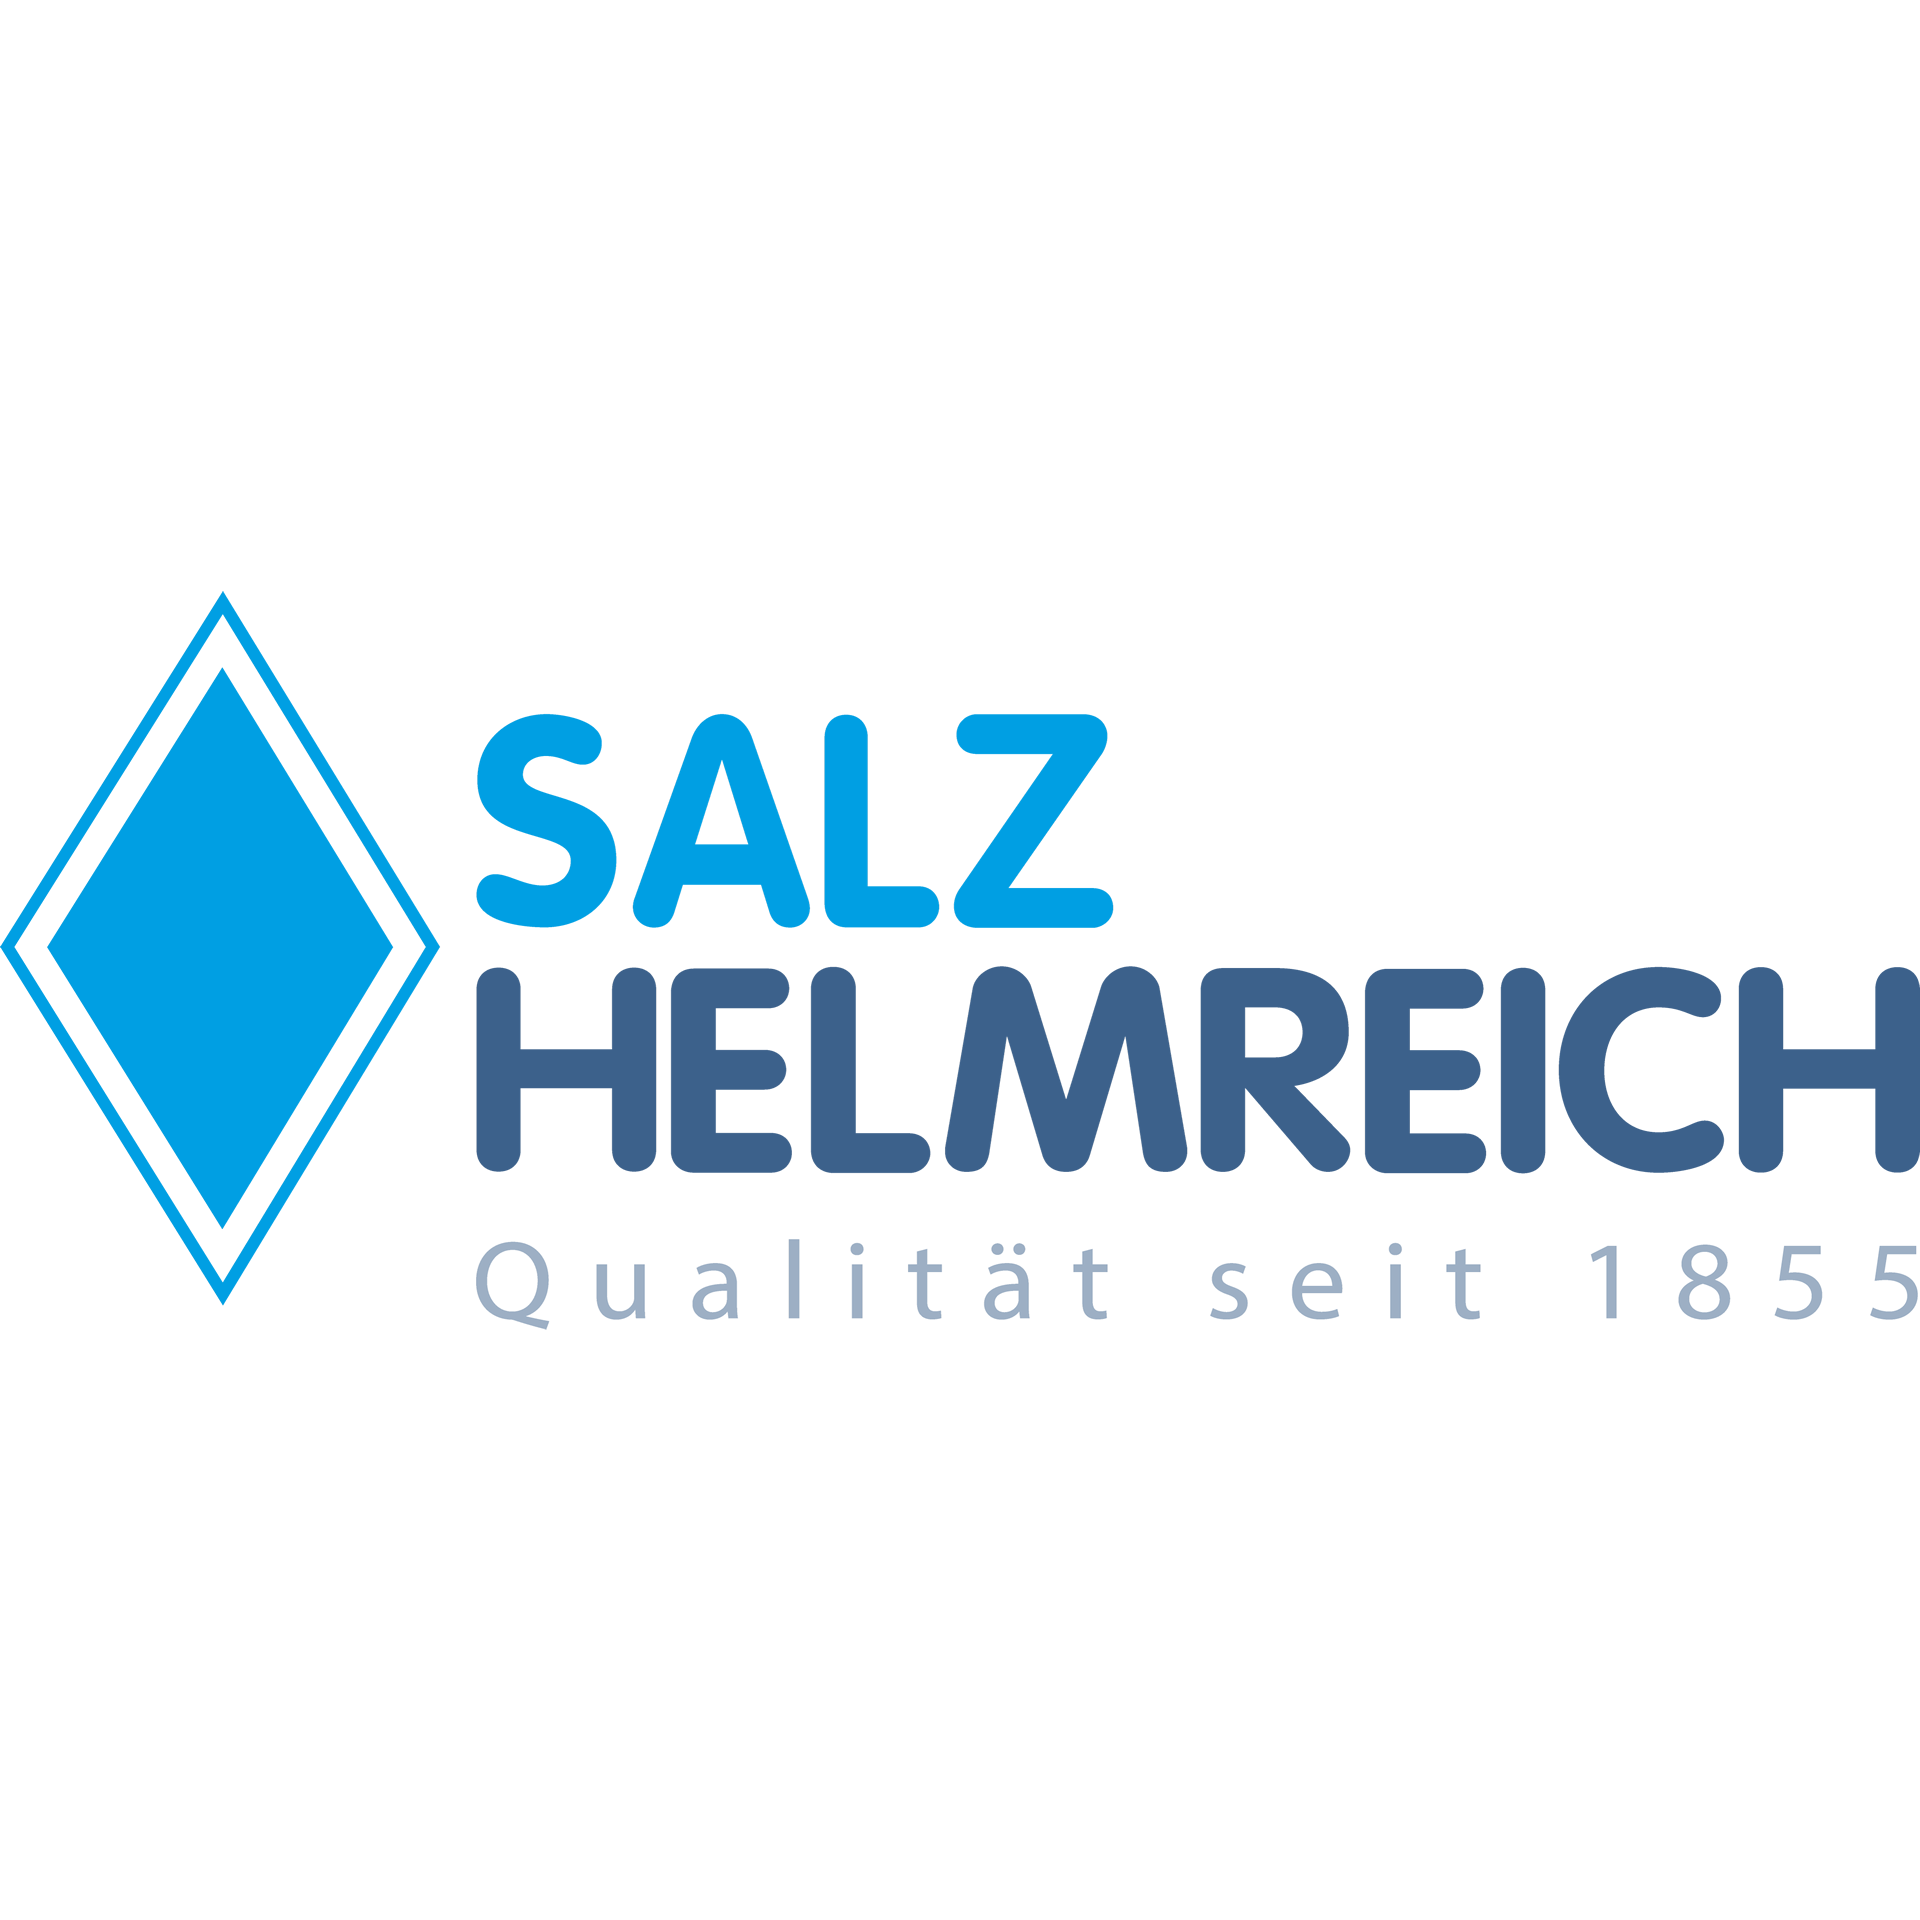 Stein - Speisesalz grob 1,4 - 0,4mm im 25kg Sack